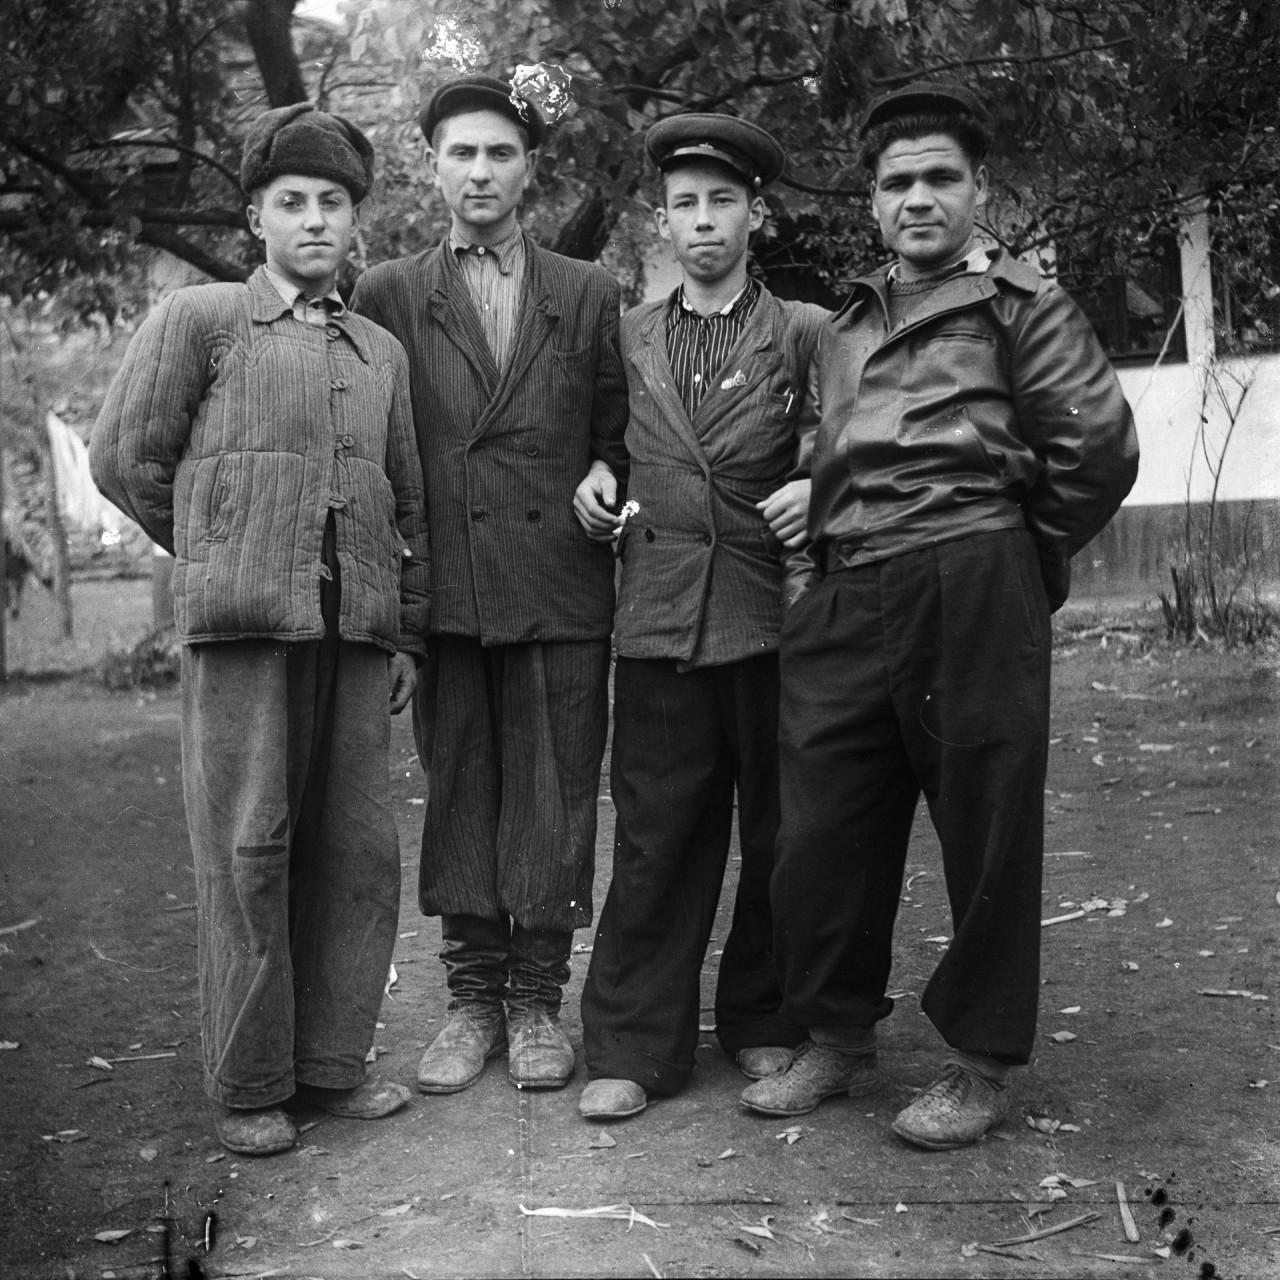 Архив сельского фотографа Захарии Кушнира (25)